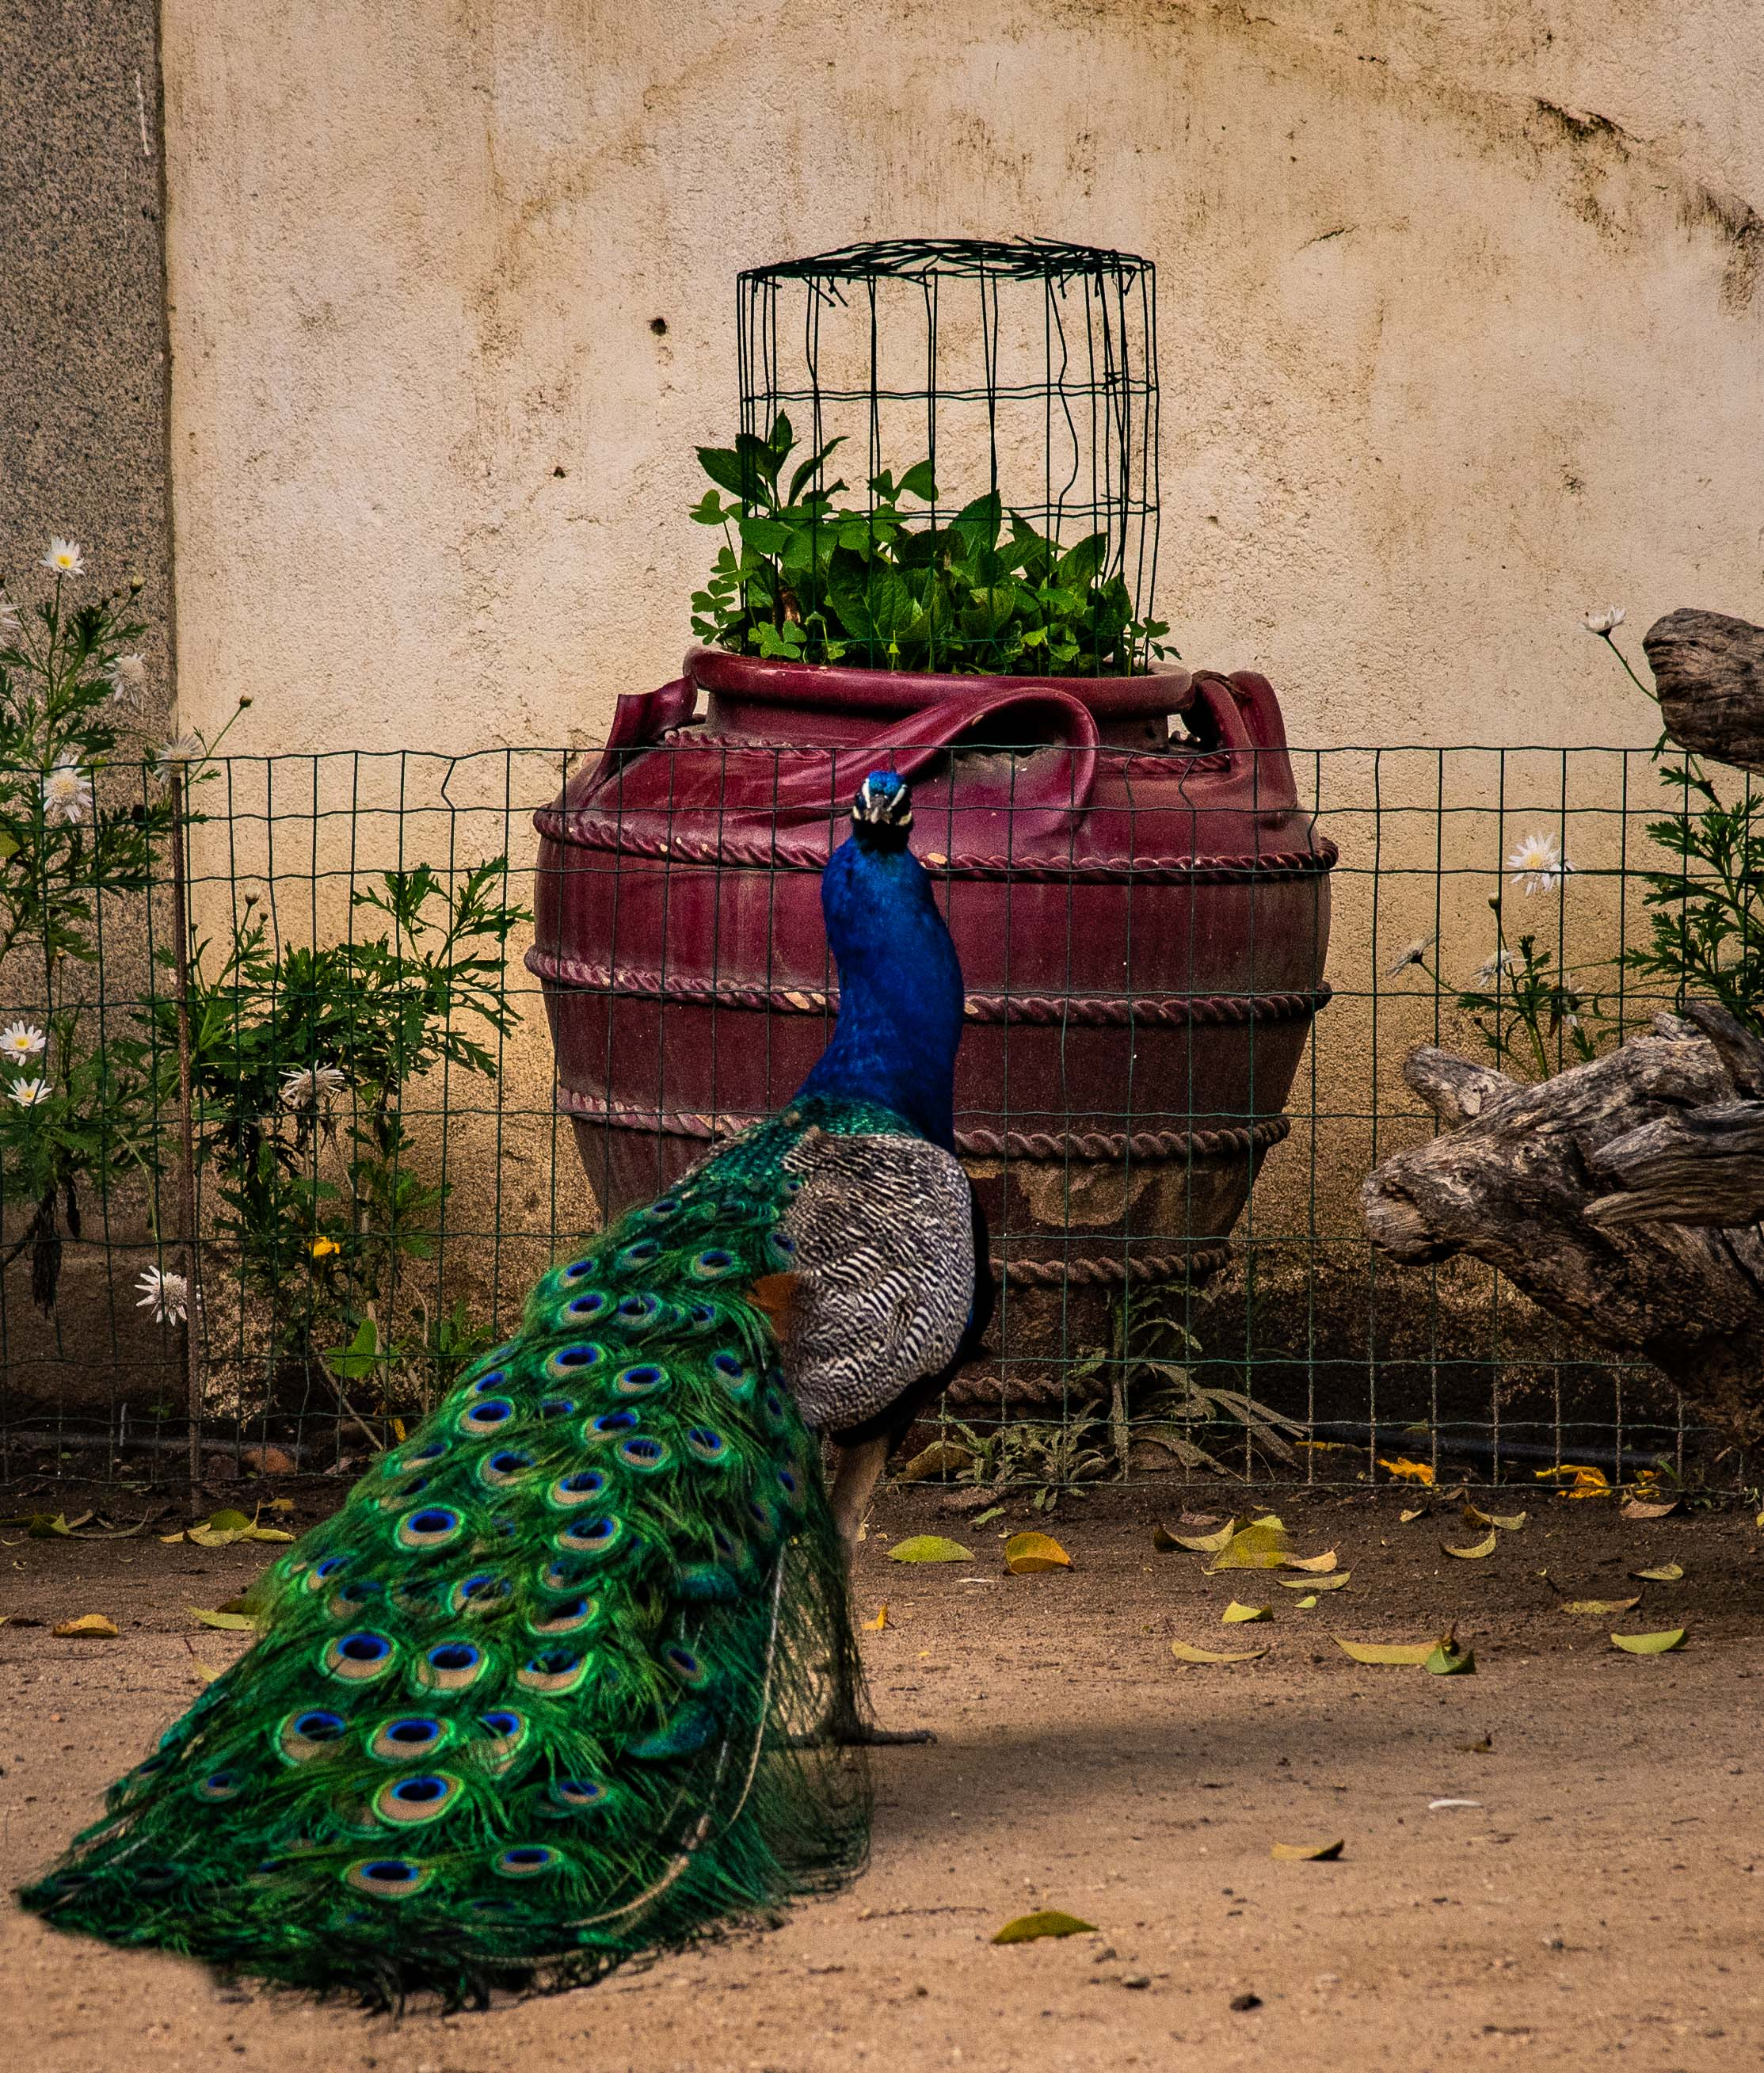 Peacock. Evora, Portugal 2018.